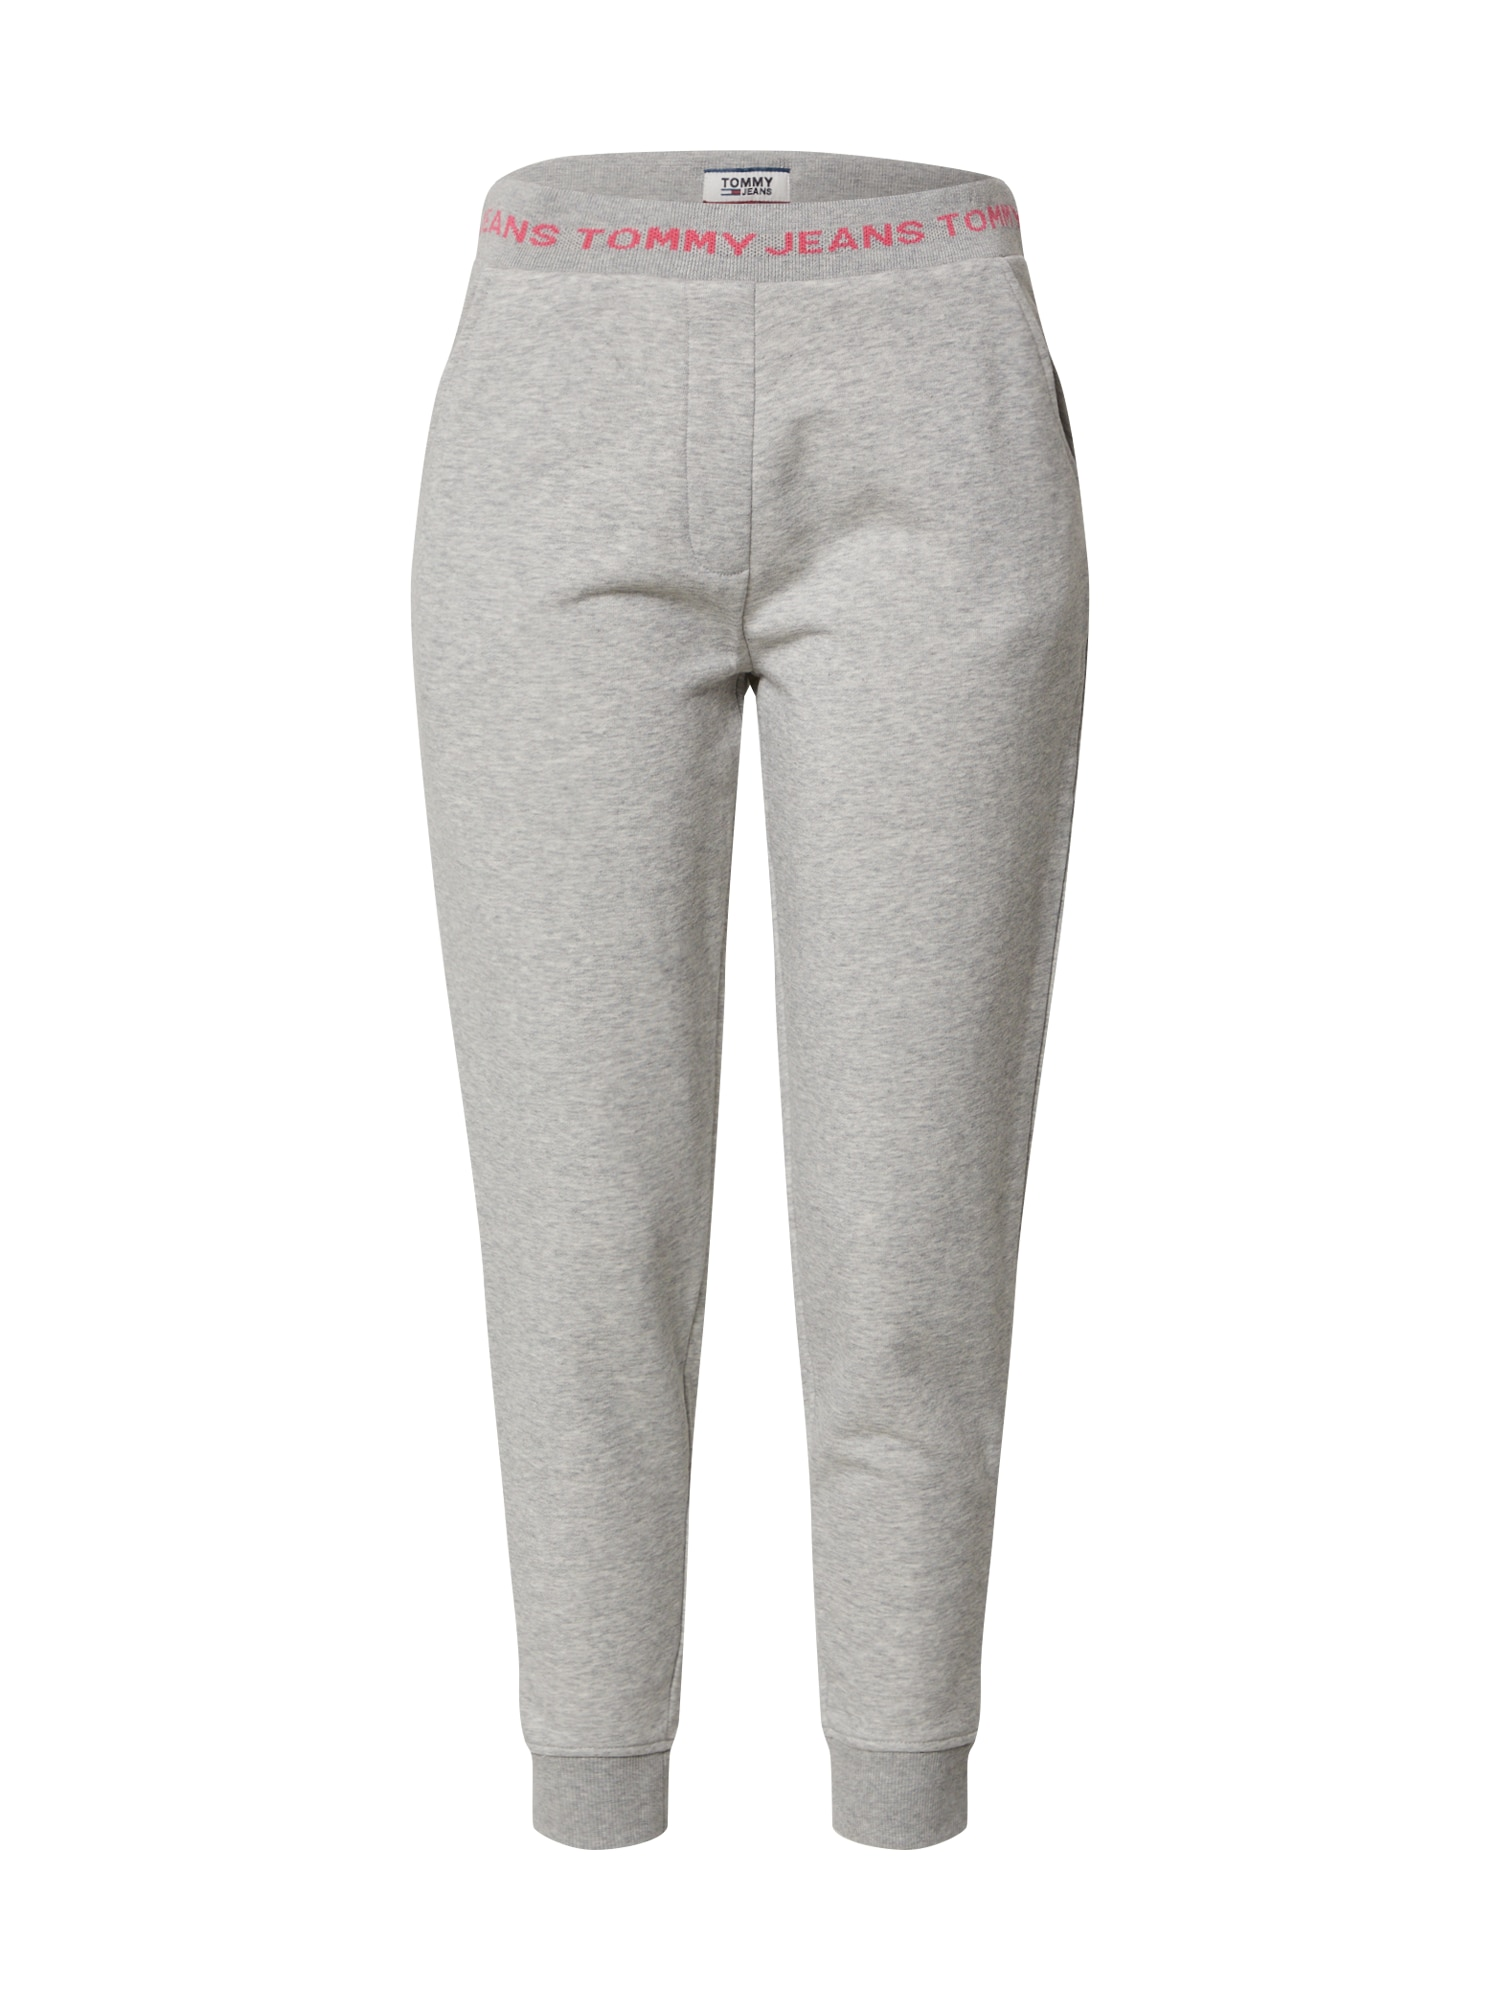 Tommy Jeans Kelnės šviesiai pilka